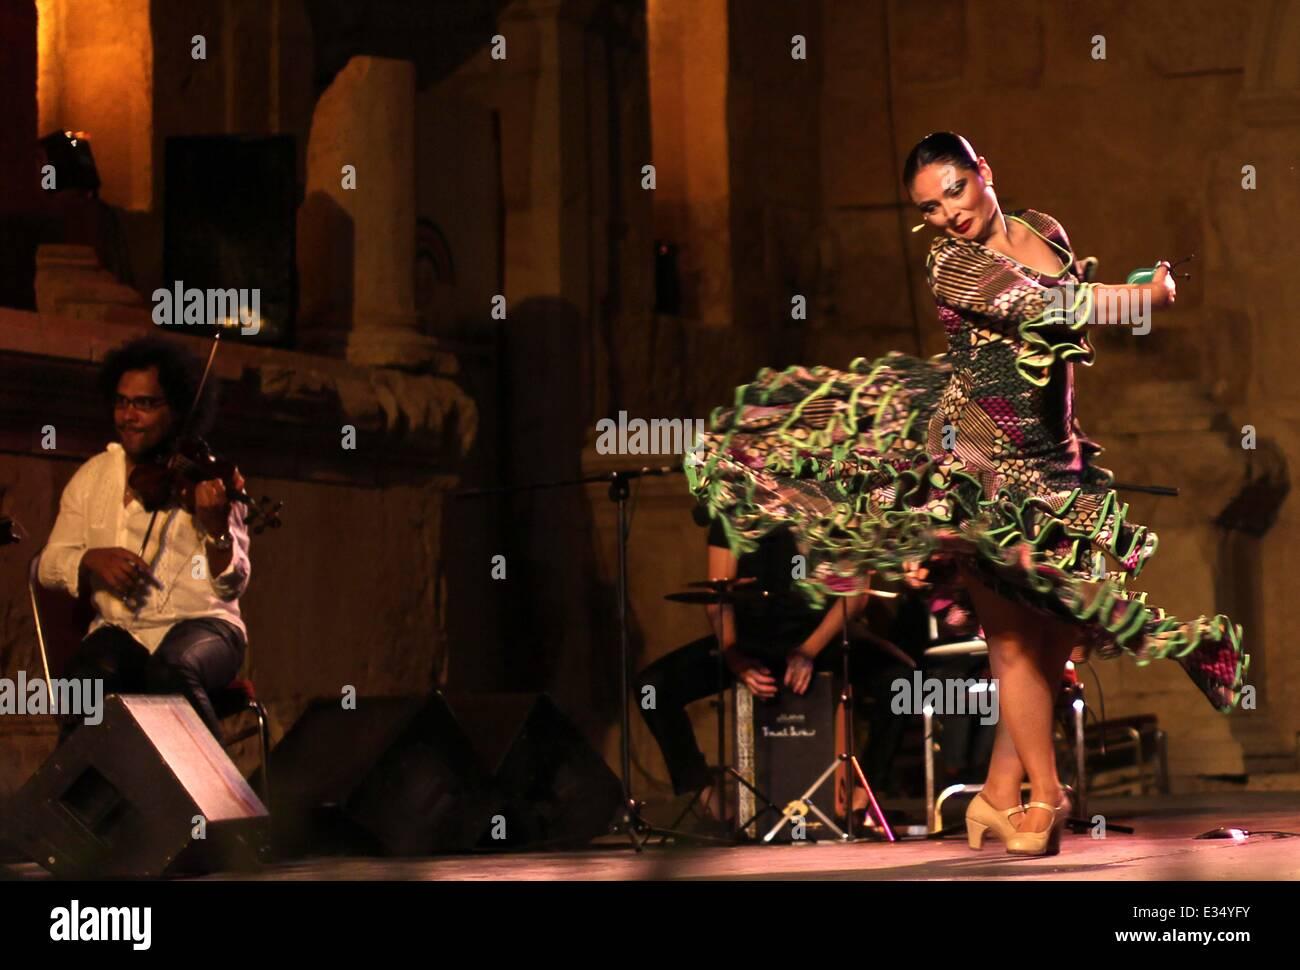 Amman, Jordan. 21st June, 2014. A Spanish Flamingo dancer perform during the Jerash festival in the Roman ancient - Stock Image